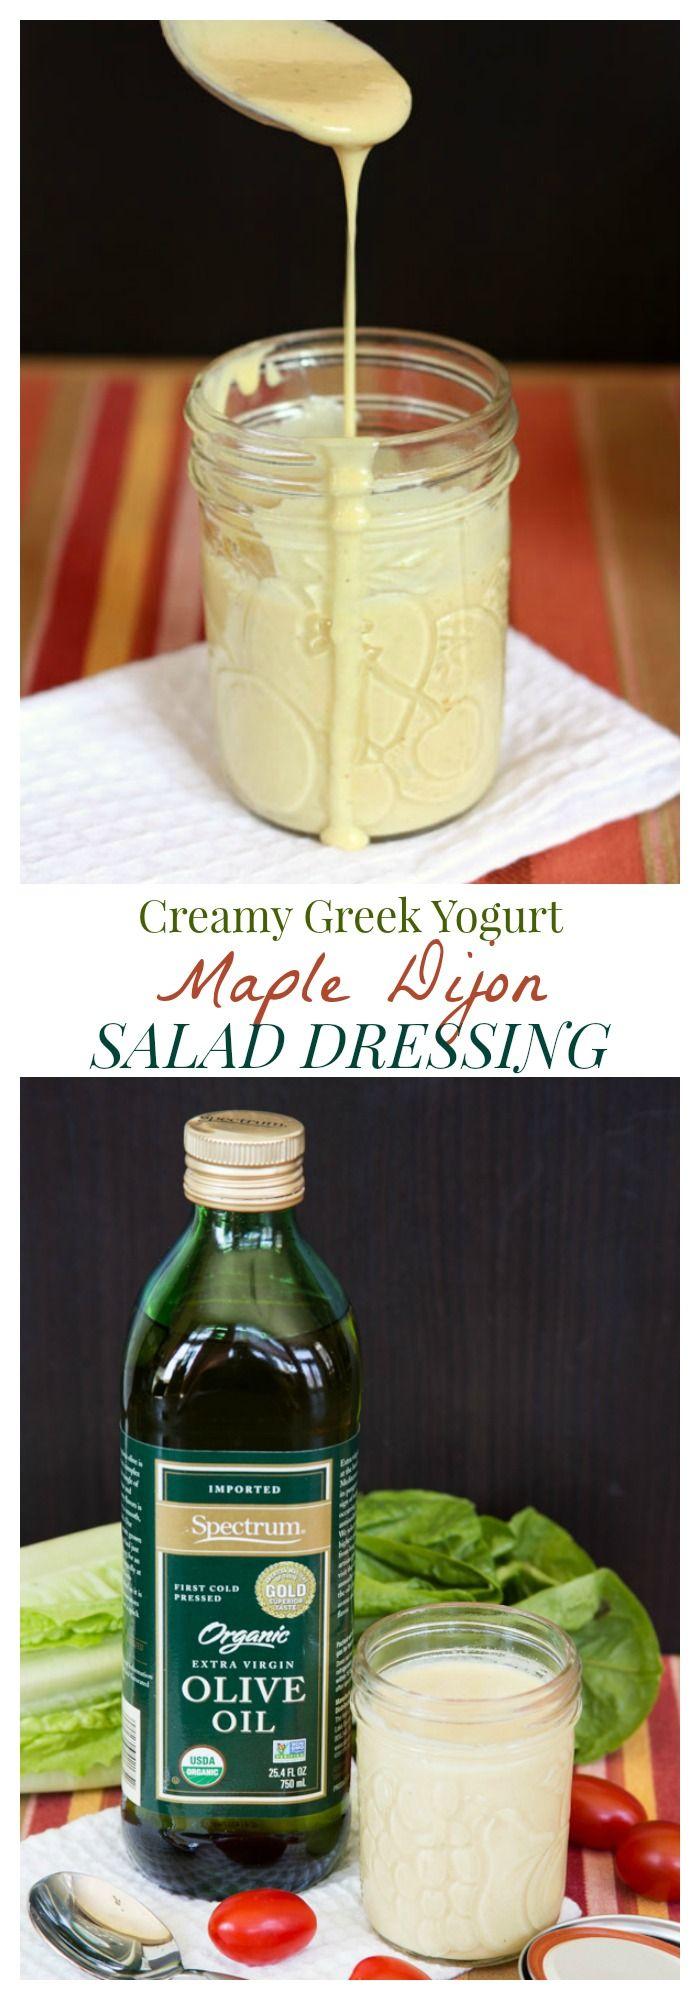 Creamy Maple Dijon Greek Yogurt Salad Dressing - it's so easy to make your own rich, creamy but still light and healthy dressing | cupcakesandkalechips.com | gluten free recipe